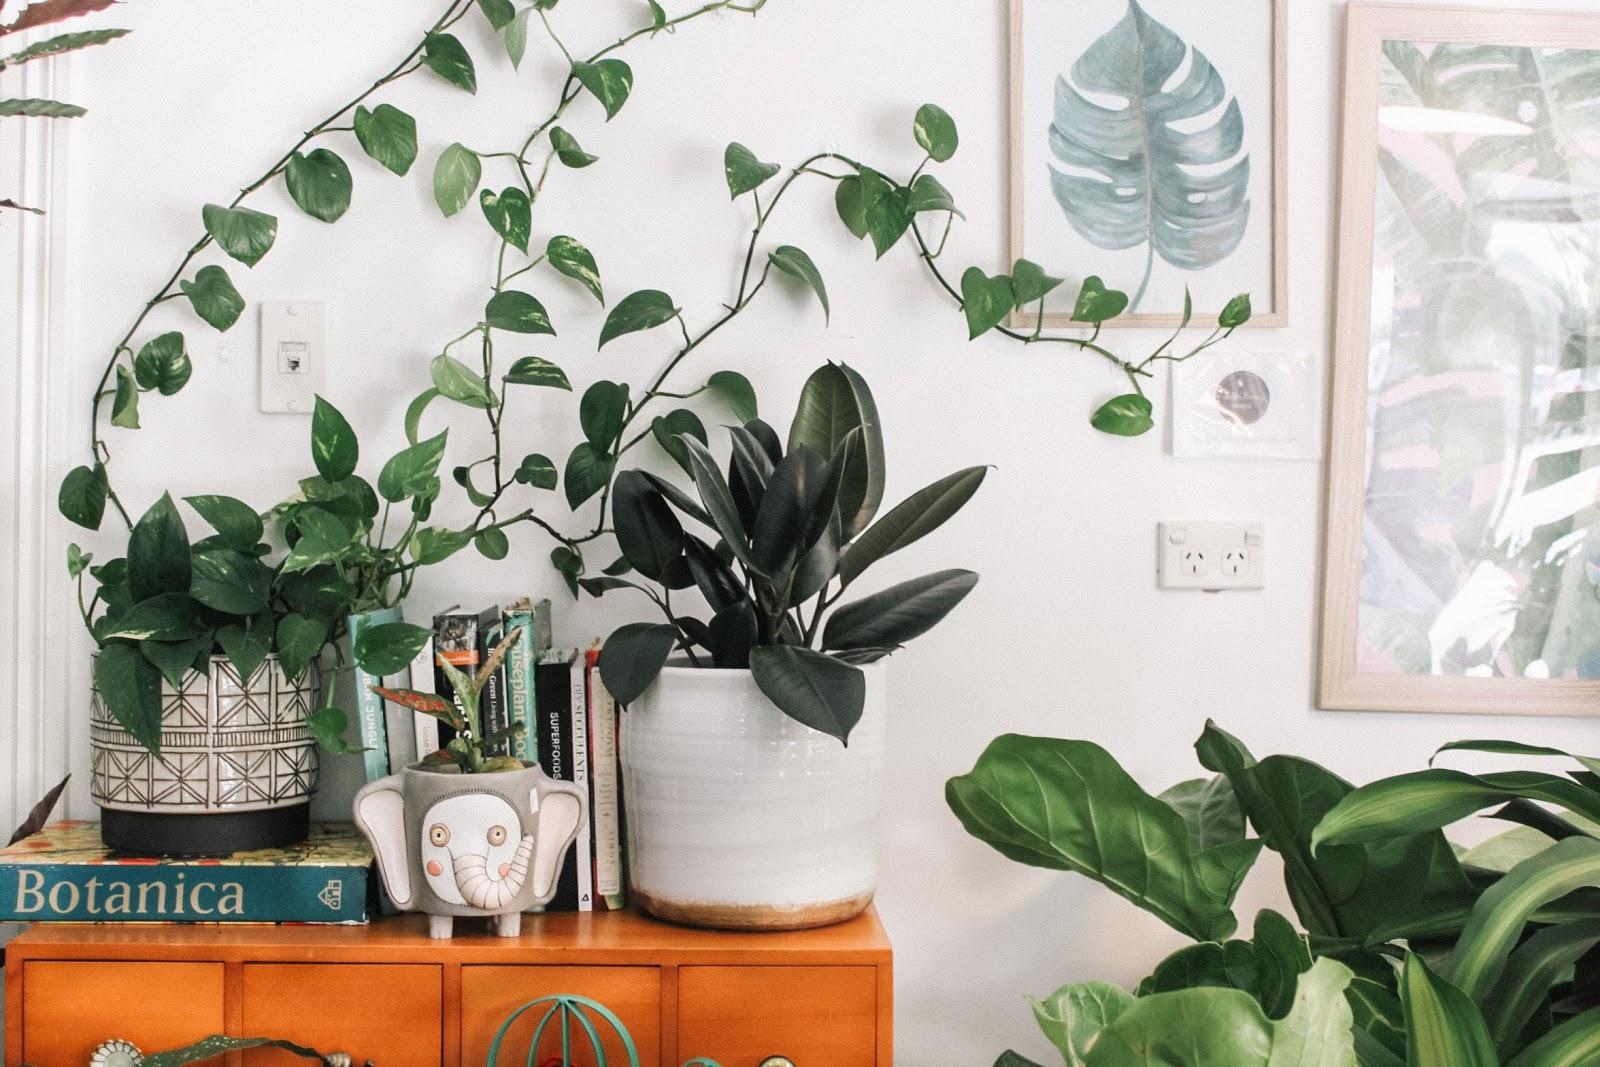 an assortment of plants on an apartment desk